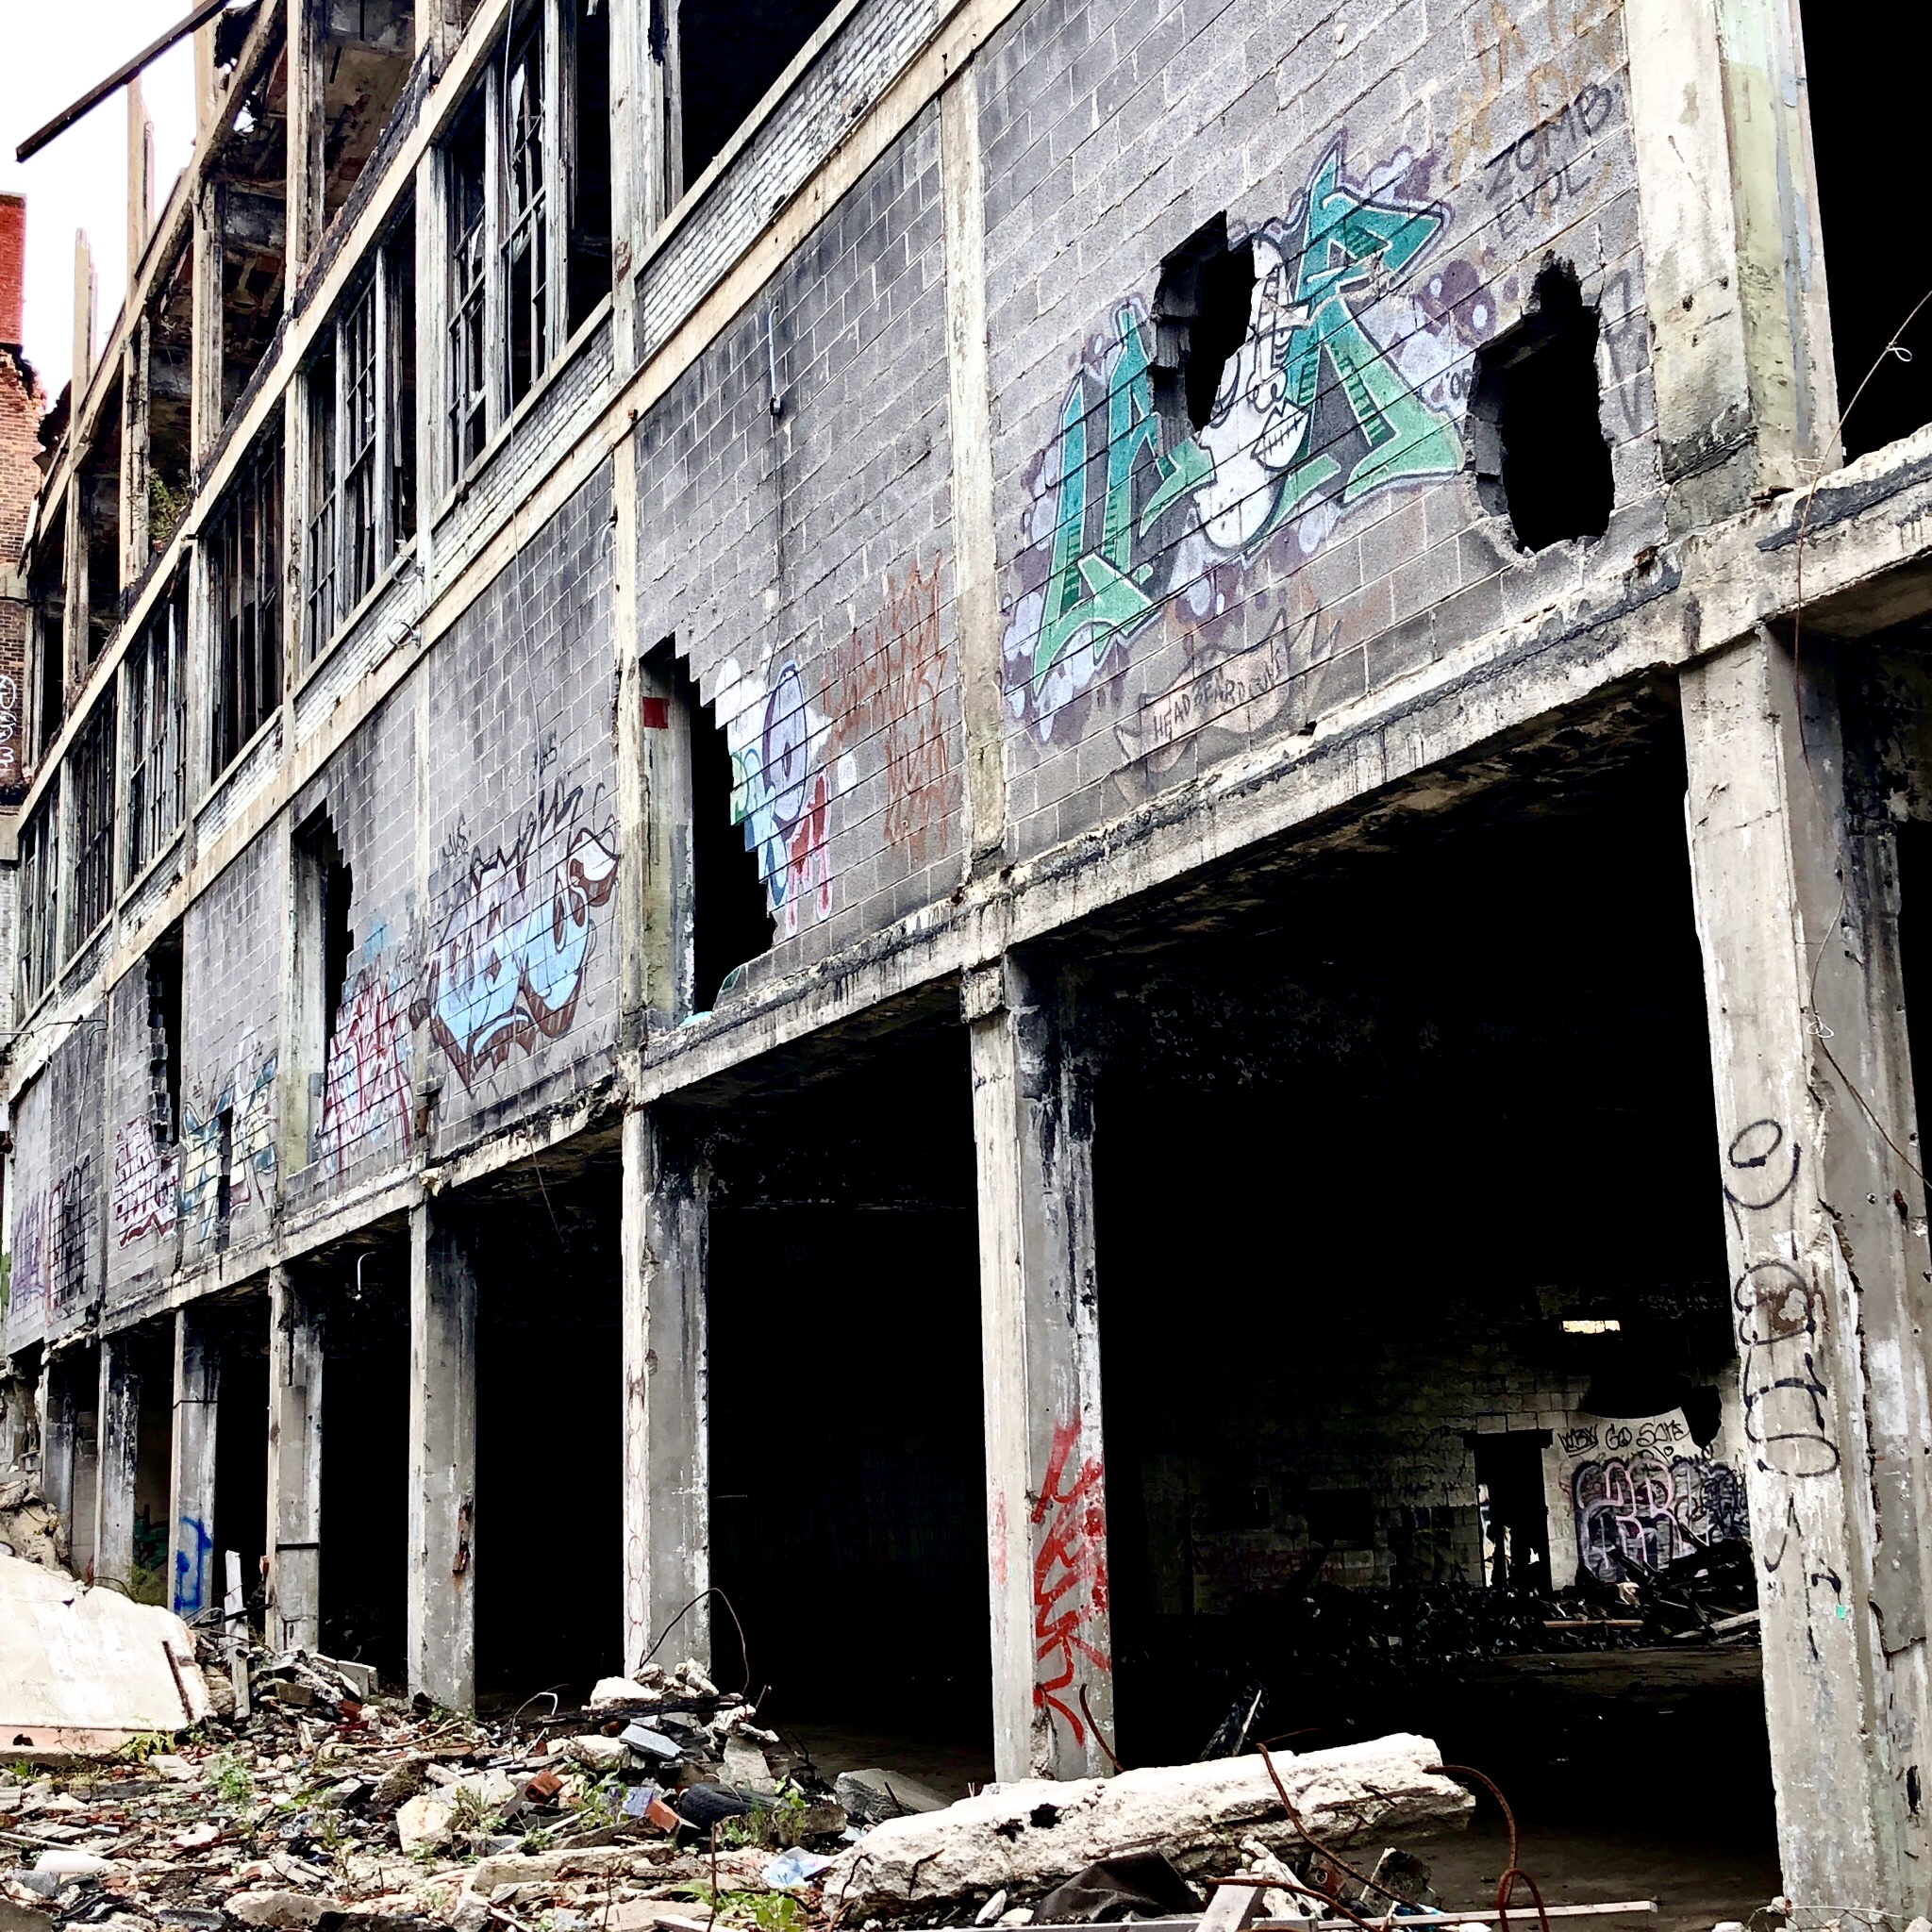 facade serie 5 - Les aventuriers de l'usine perdue